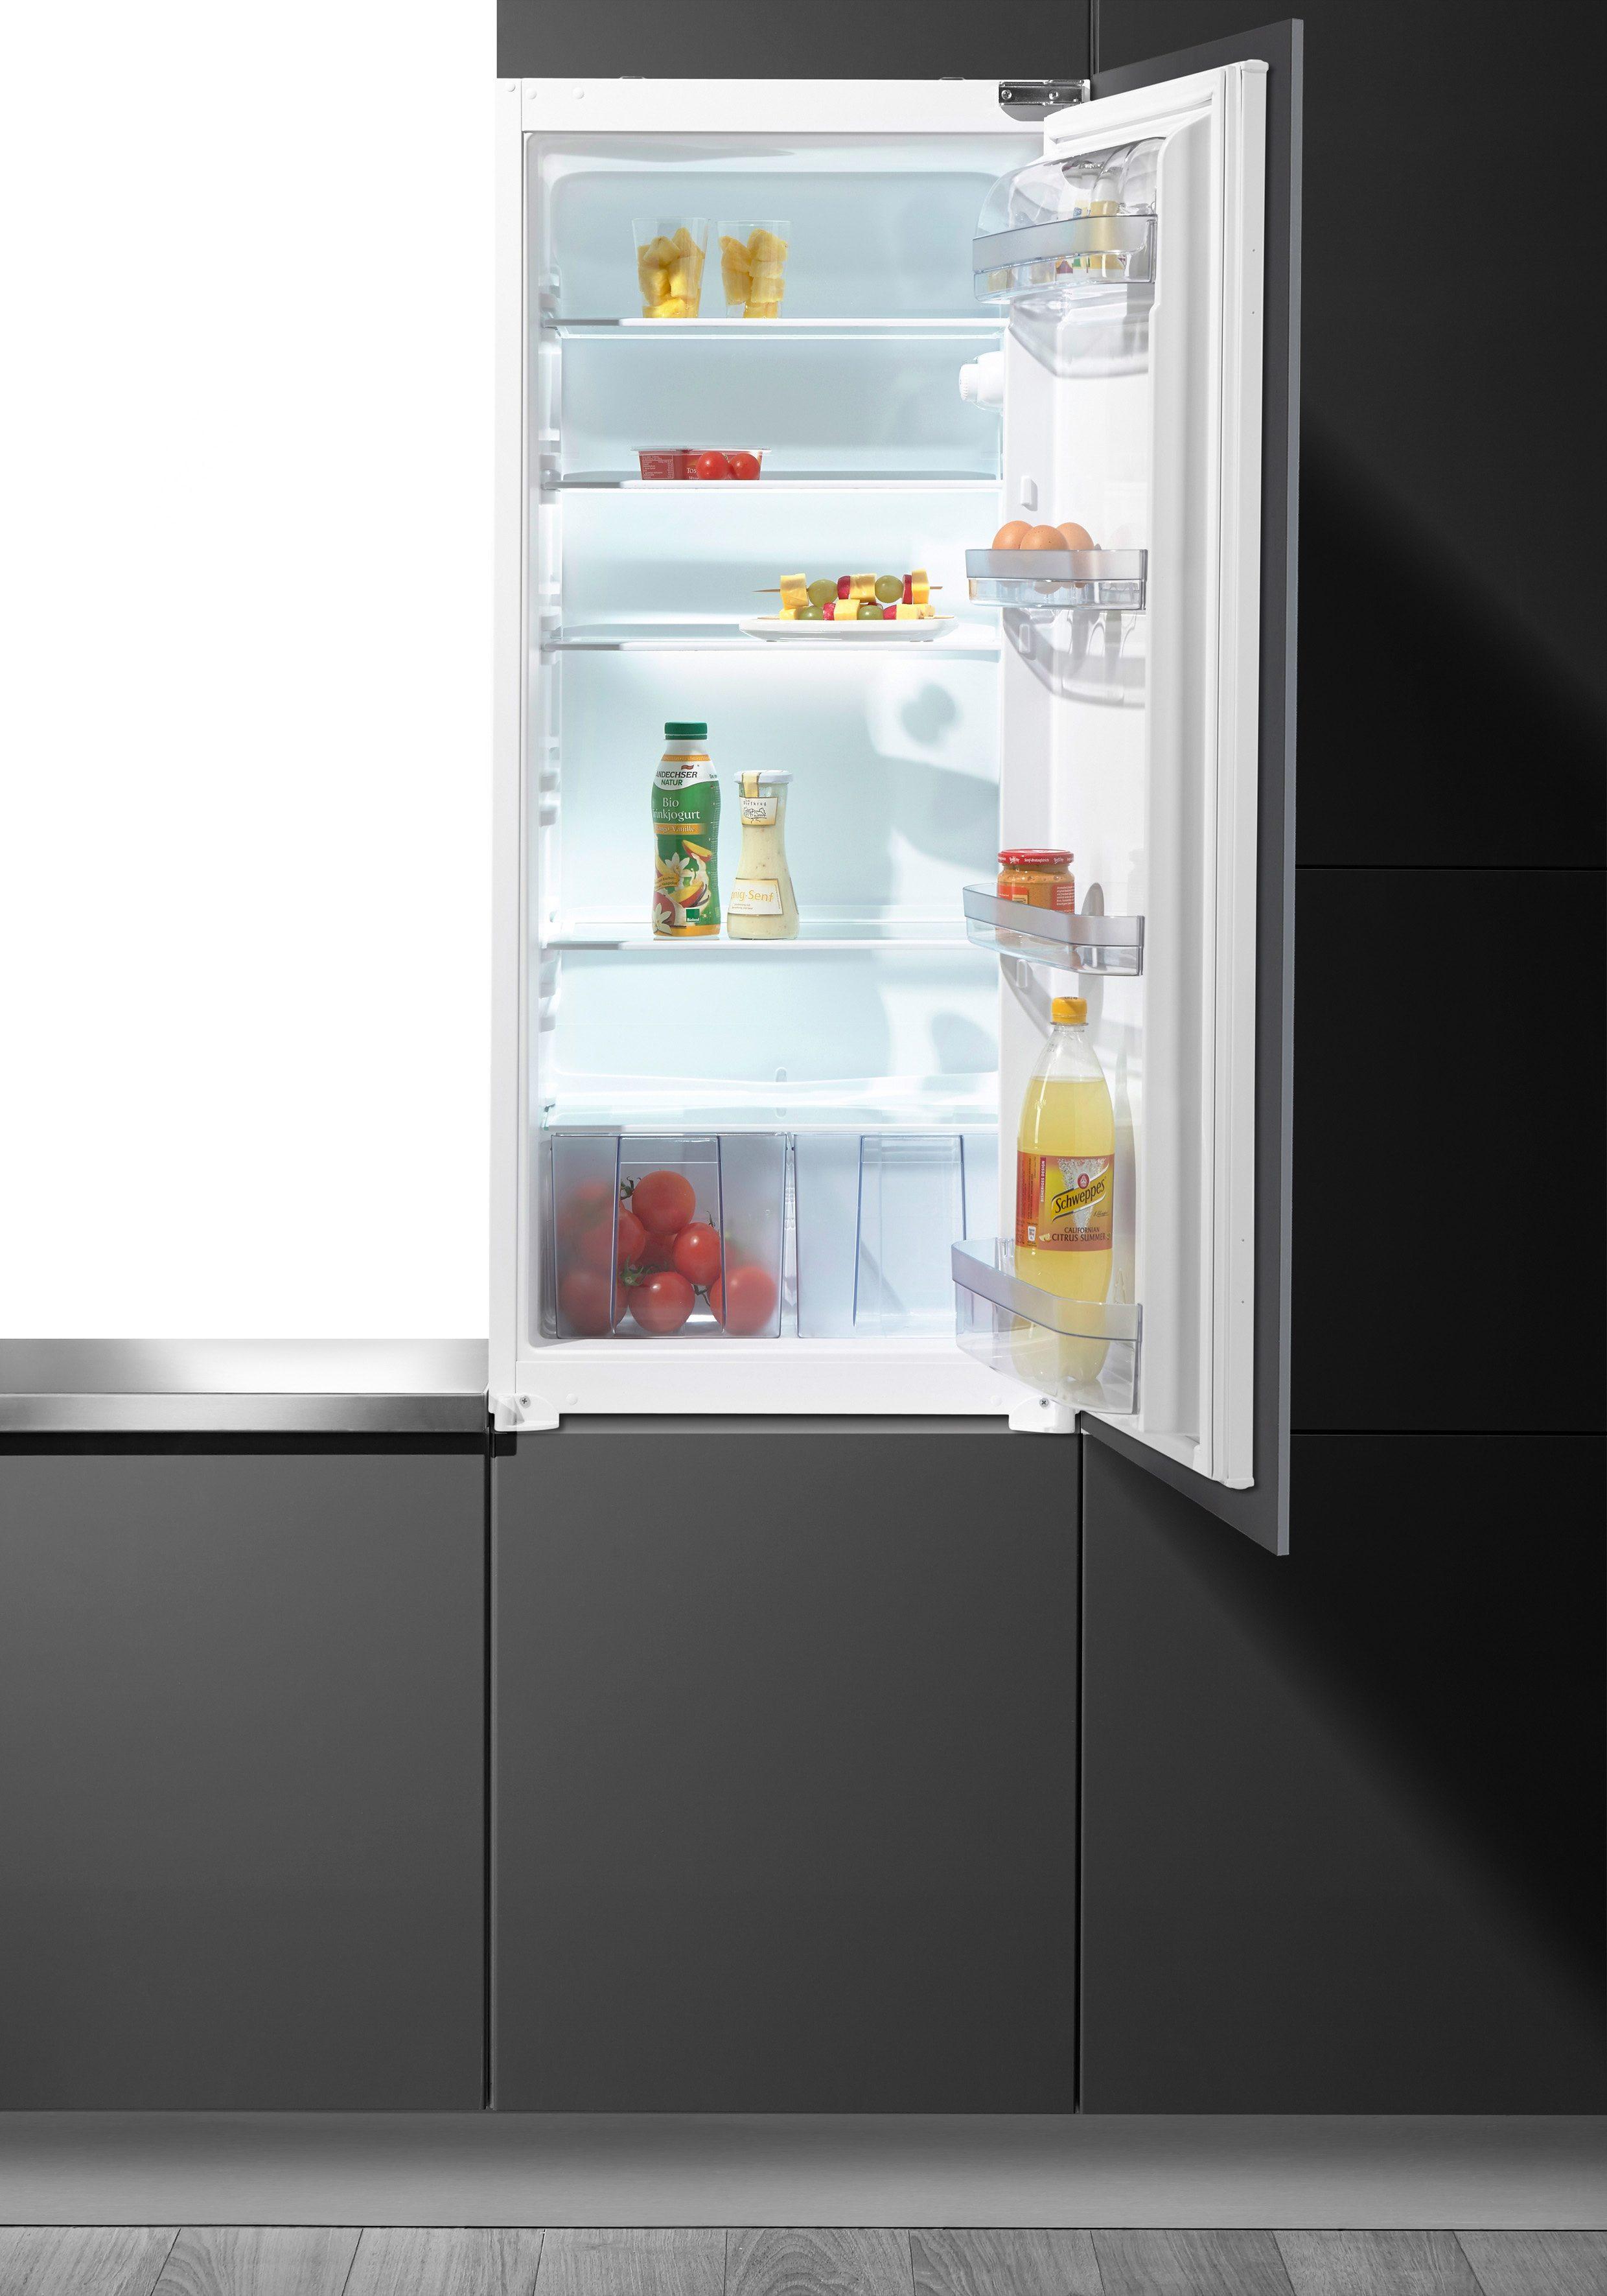 Vestfrost Einbaukühlschrank VKSE 102500 SA++ G, A++, 122,5 cm hoch